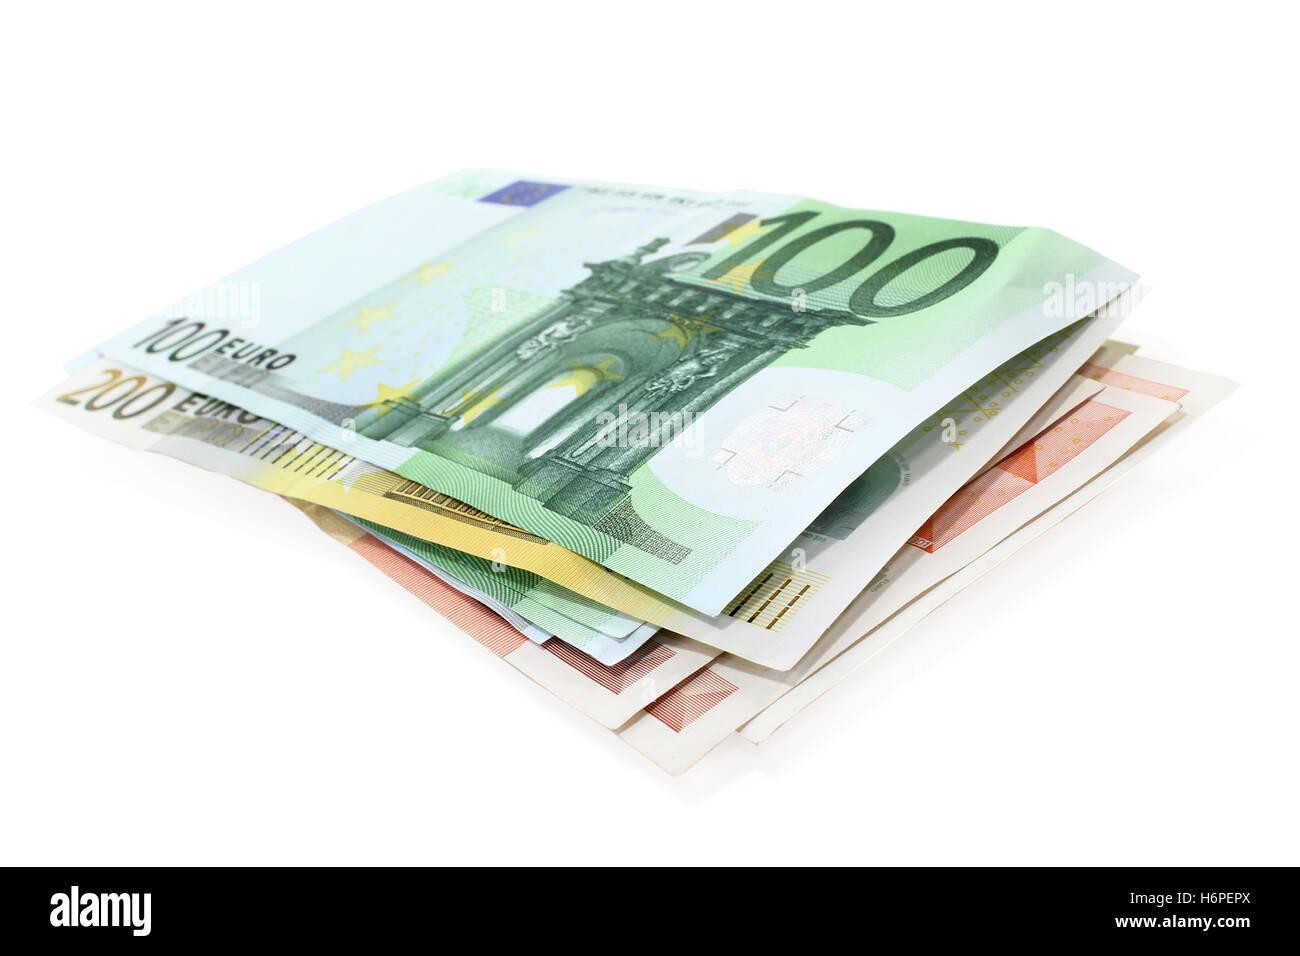 Geld, Finanzen Stockbild